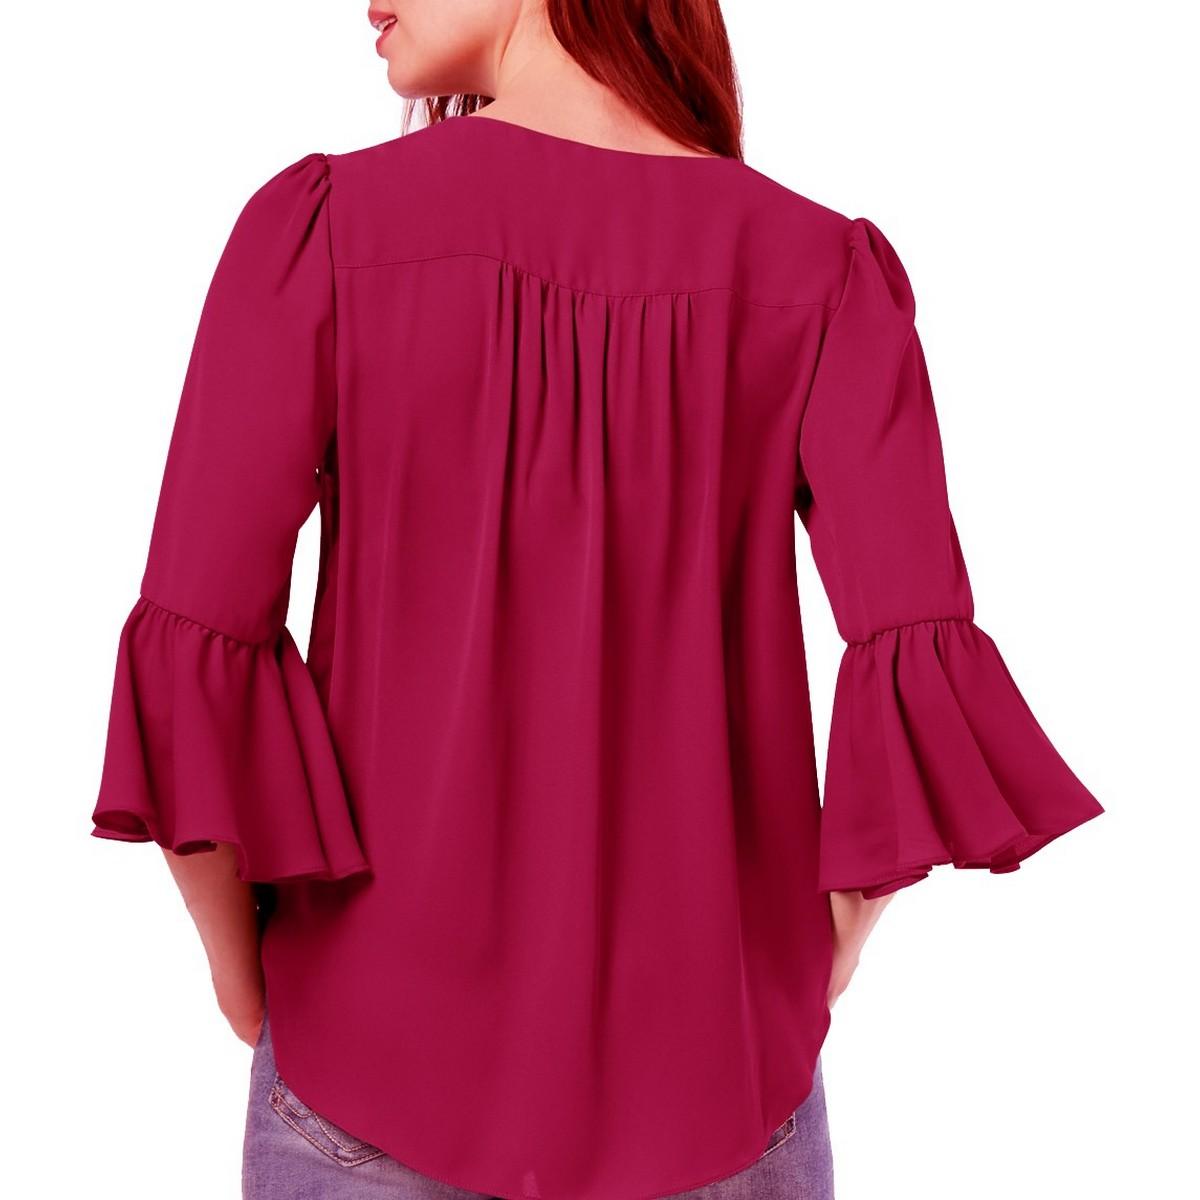 INC-NEW-Women-039-s-Surplice-Bell-Sleeve-High-Low-Blouse-Shirt-Top-TEDO thumbnail 10